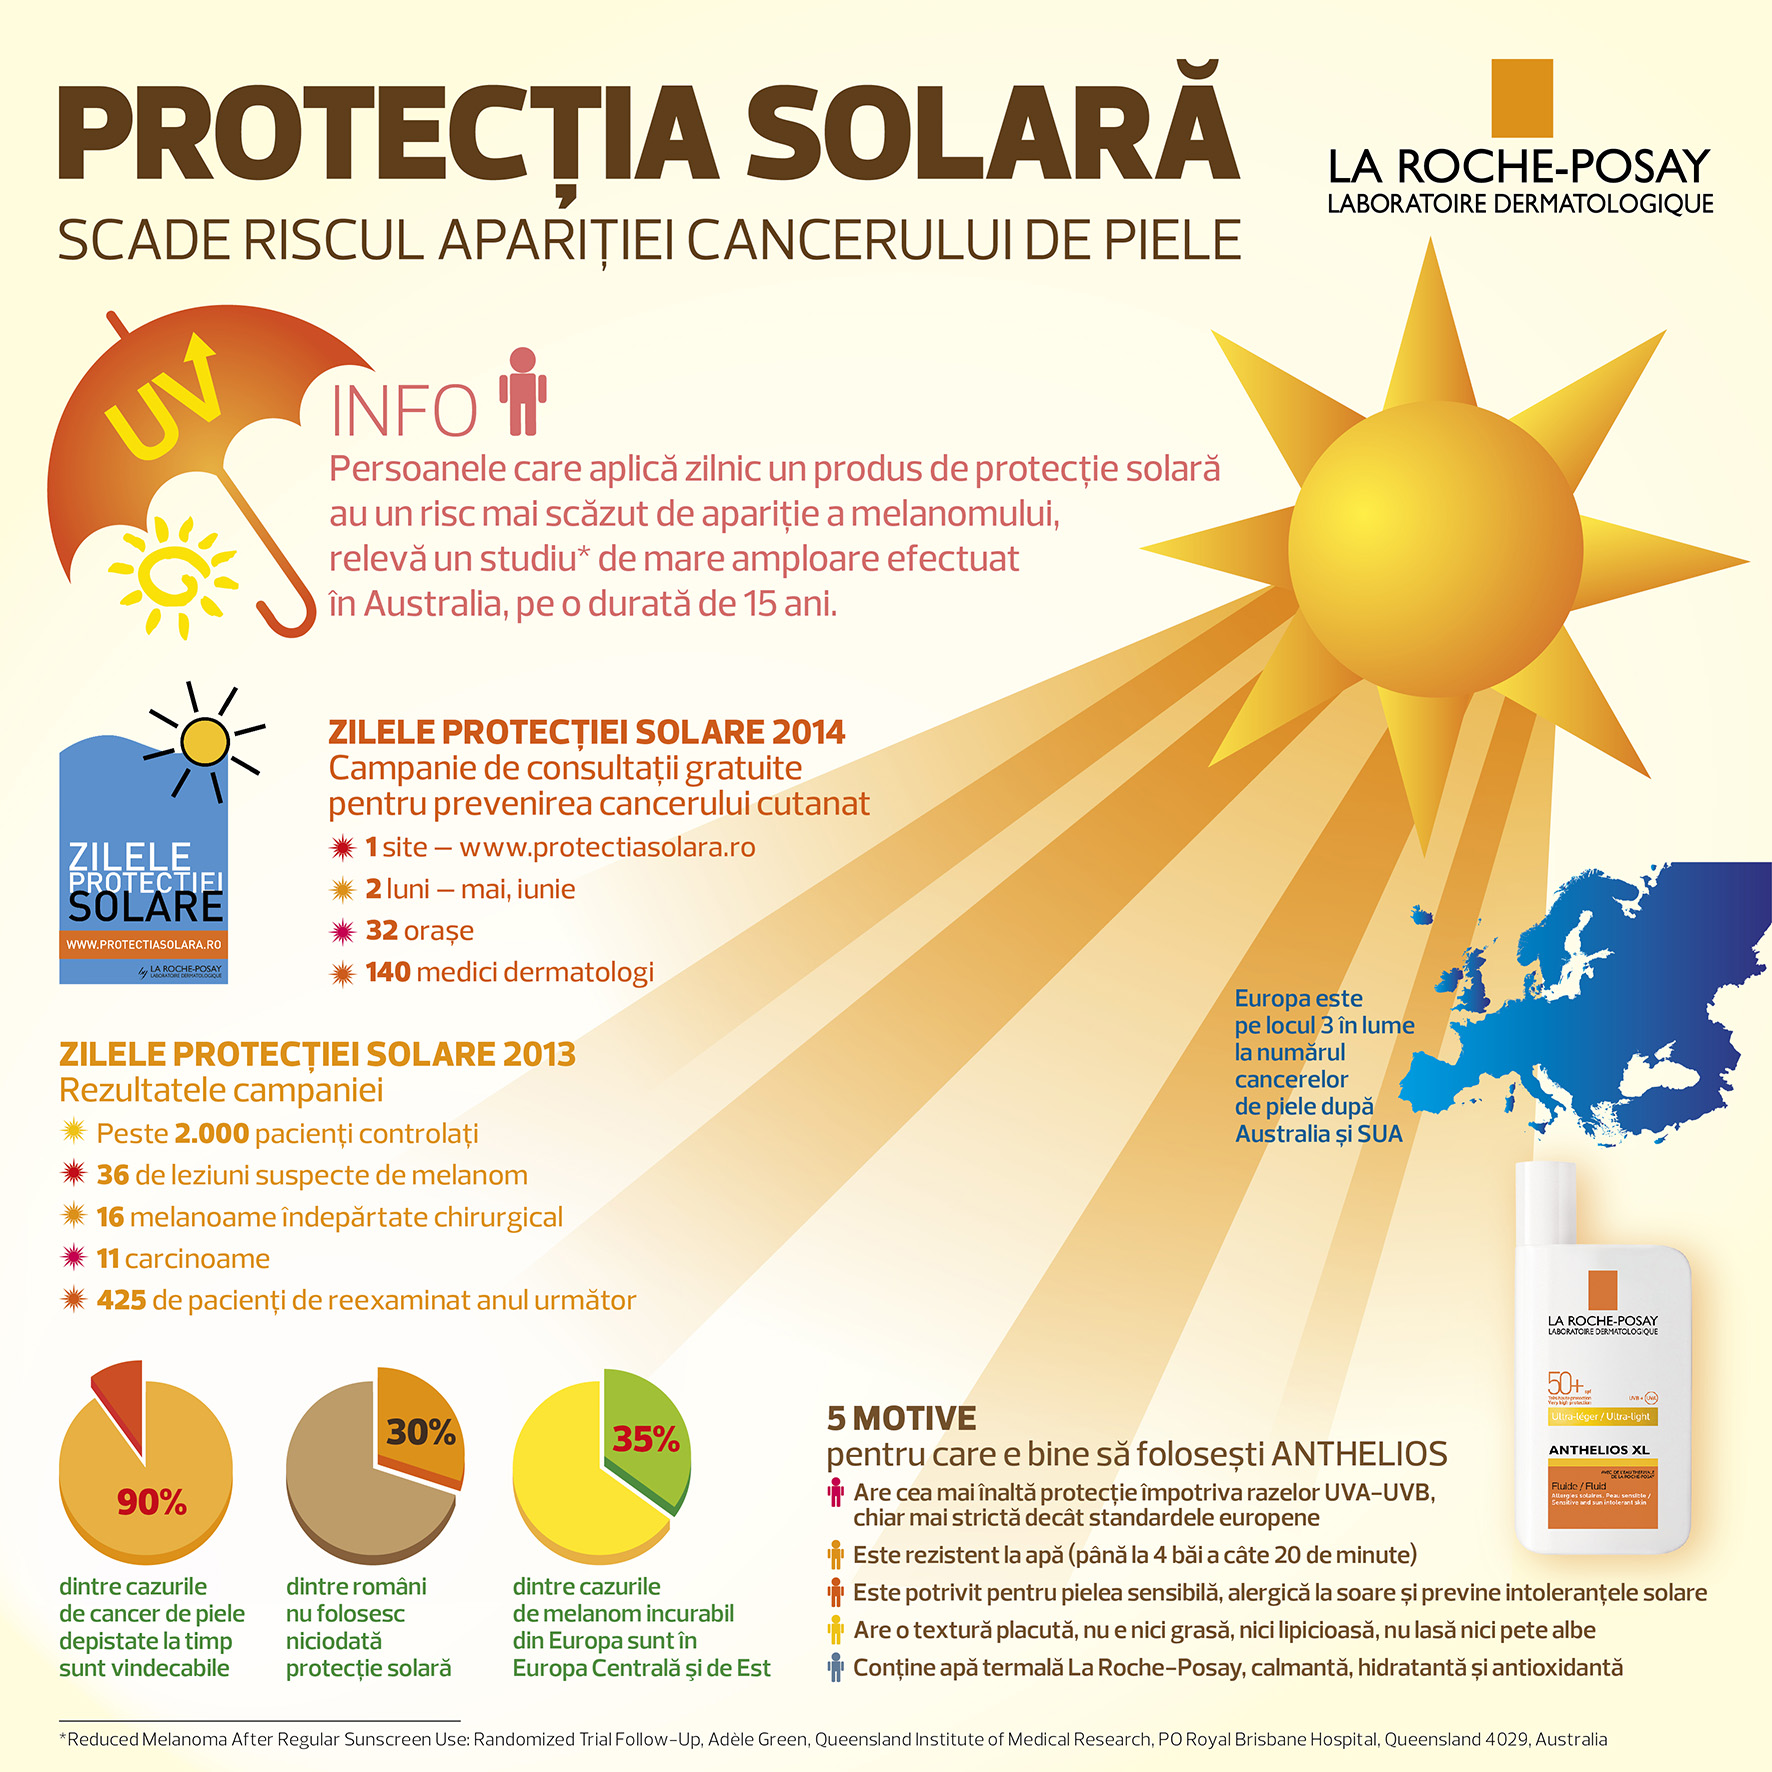 protectia solara (2)